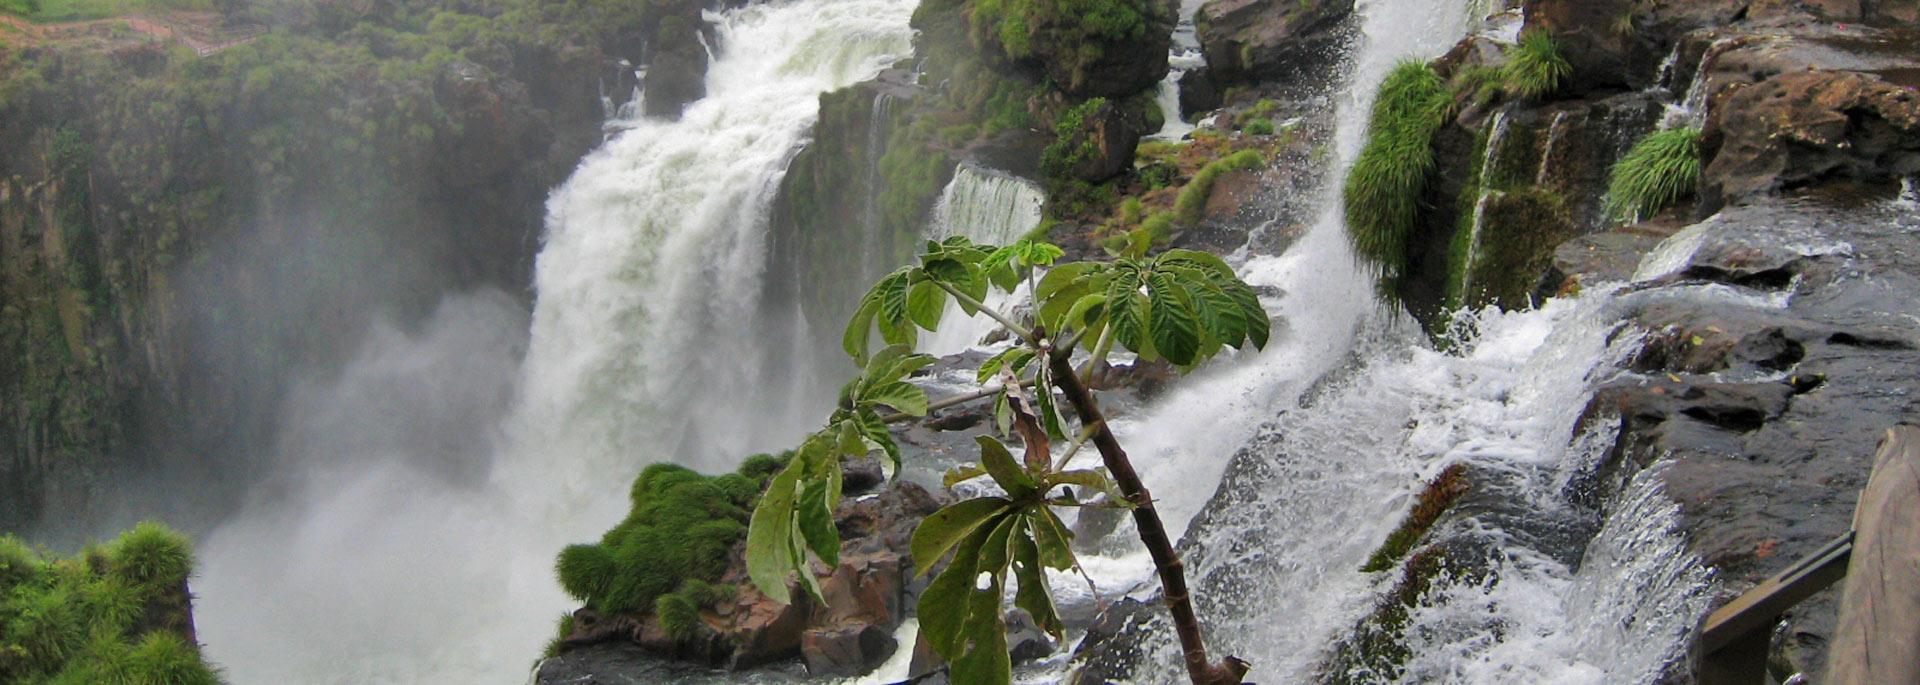 Fotos: Iguazu Wasserfälle